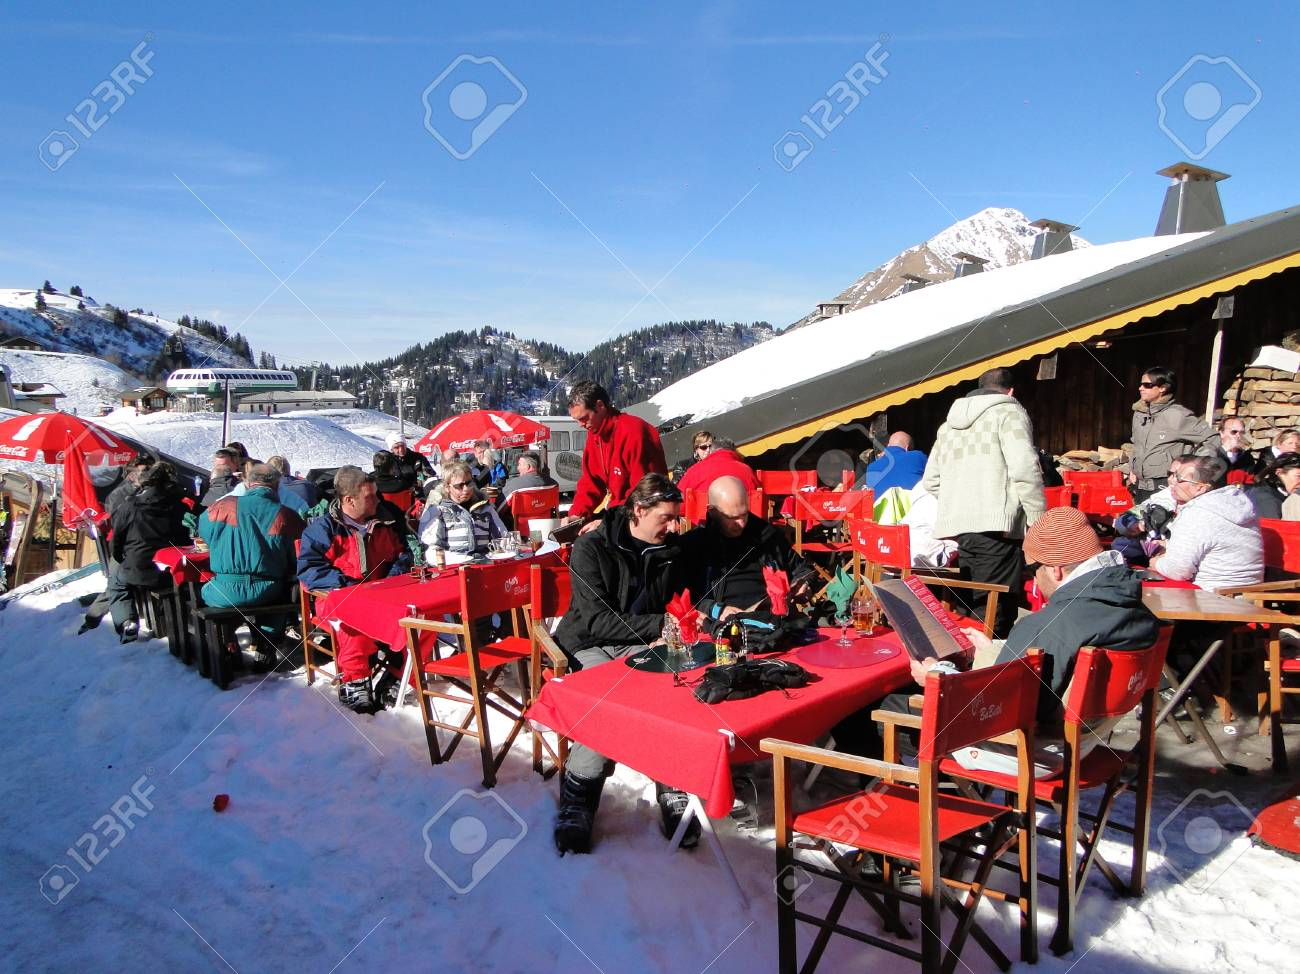 PORTES DU SOLEIL, FRANCE - FEB 10 - Skiers enjoy their lunch on a sunny day  on Feb 10, 2011, near Chatel, France Stock Photo - 10104752